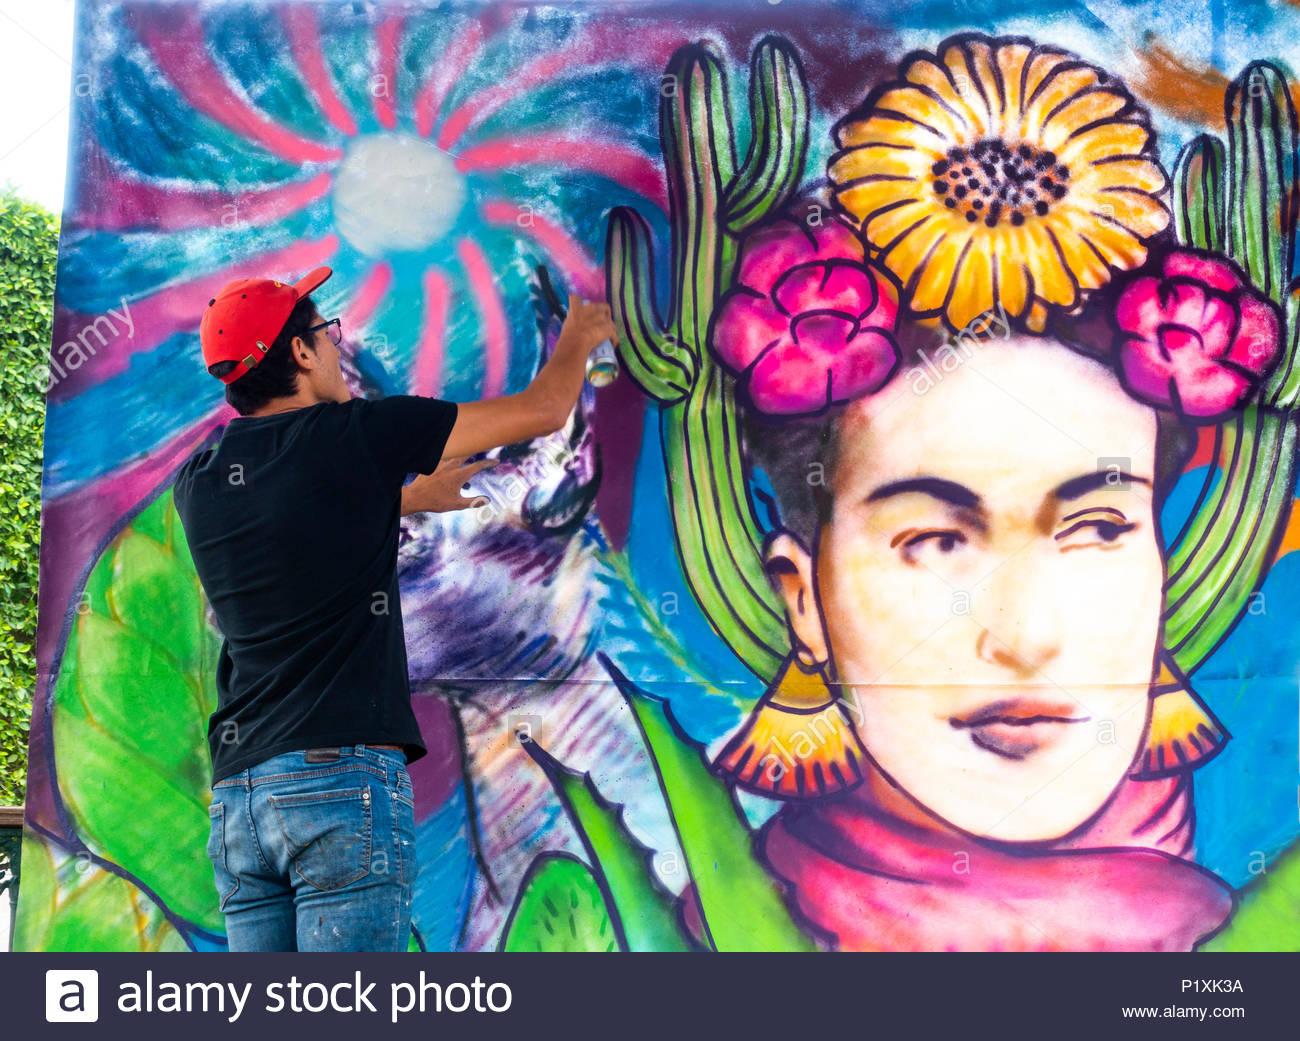 Mural artist painting in the gazebo of El Jardin in the center of San Miguel de Allende - Stock Image